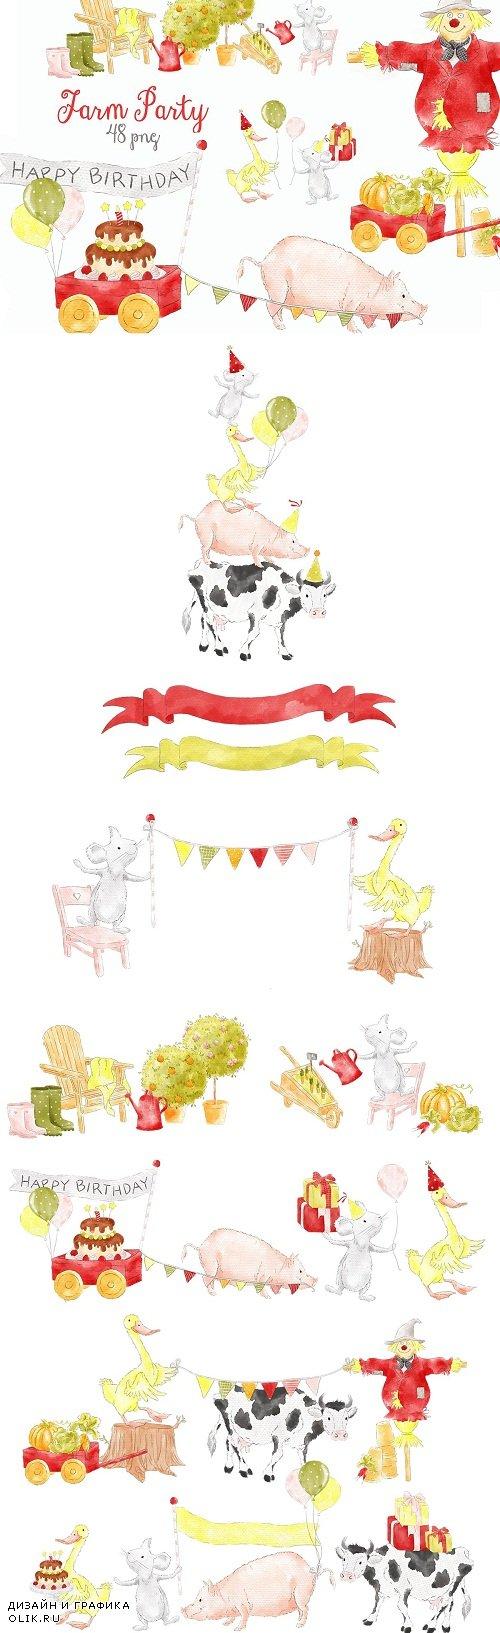 Farm Party Barnyard Animals Clipart - 3723105